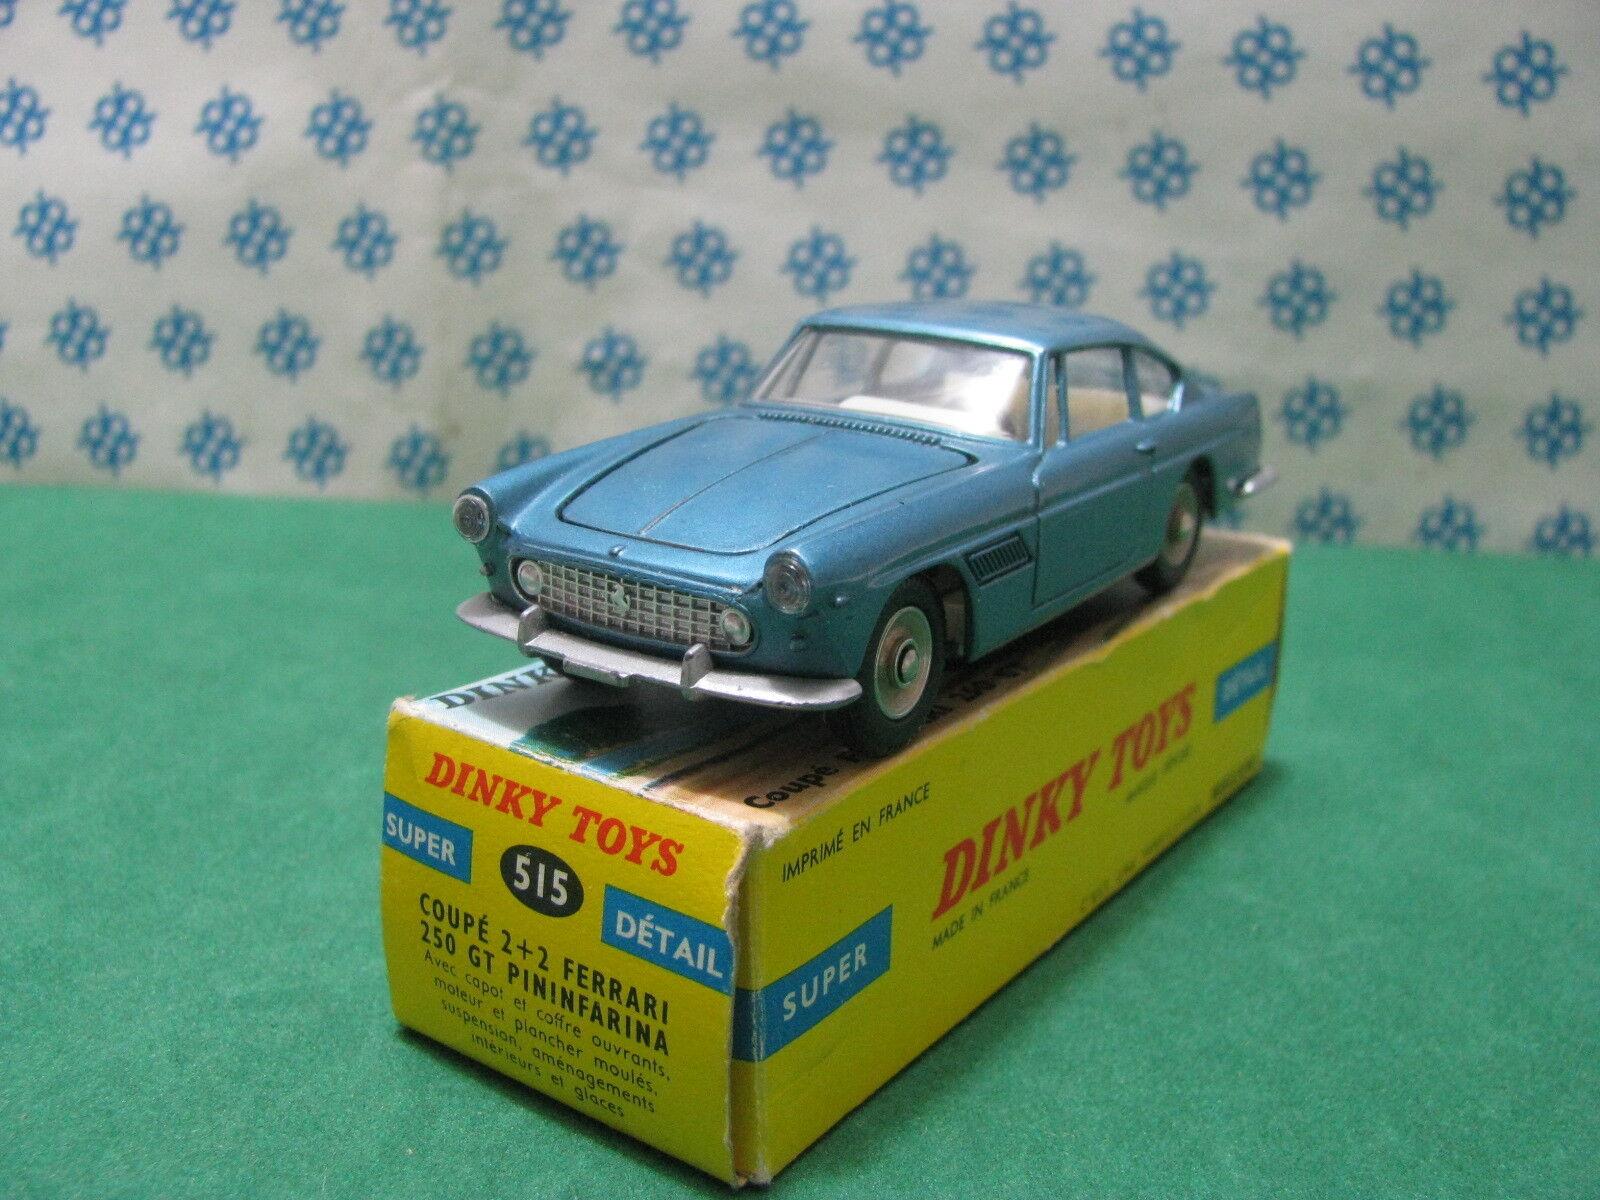 Vintage - Dinky Toys 515 - Ferrari 250 2+2 Gt Pininfarina Coupé - Mint Boîte